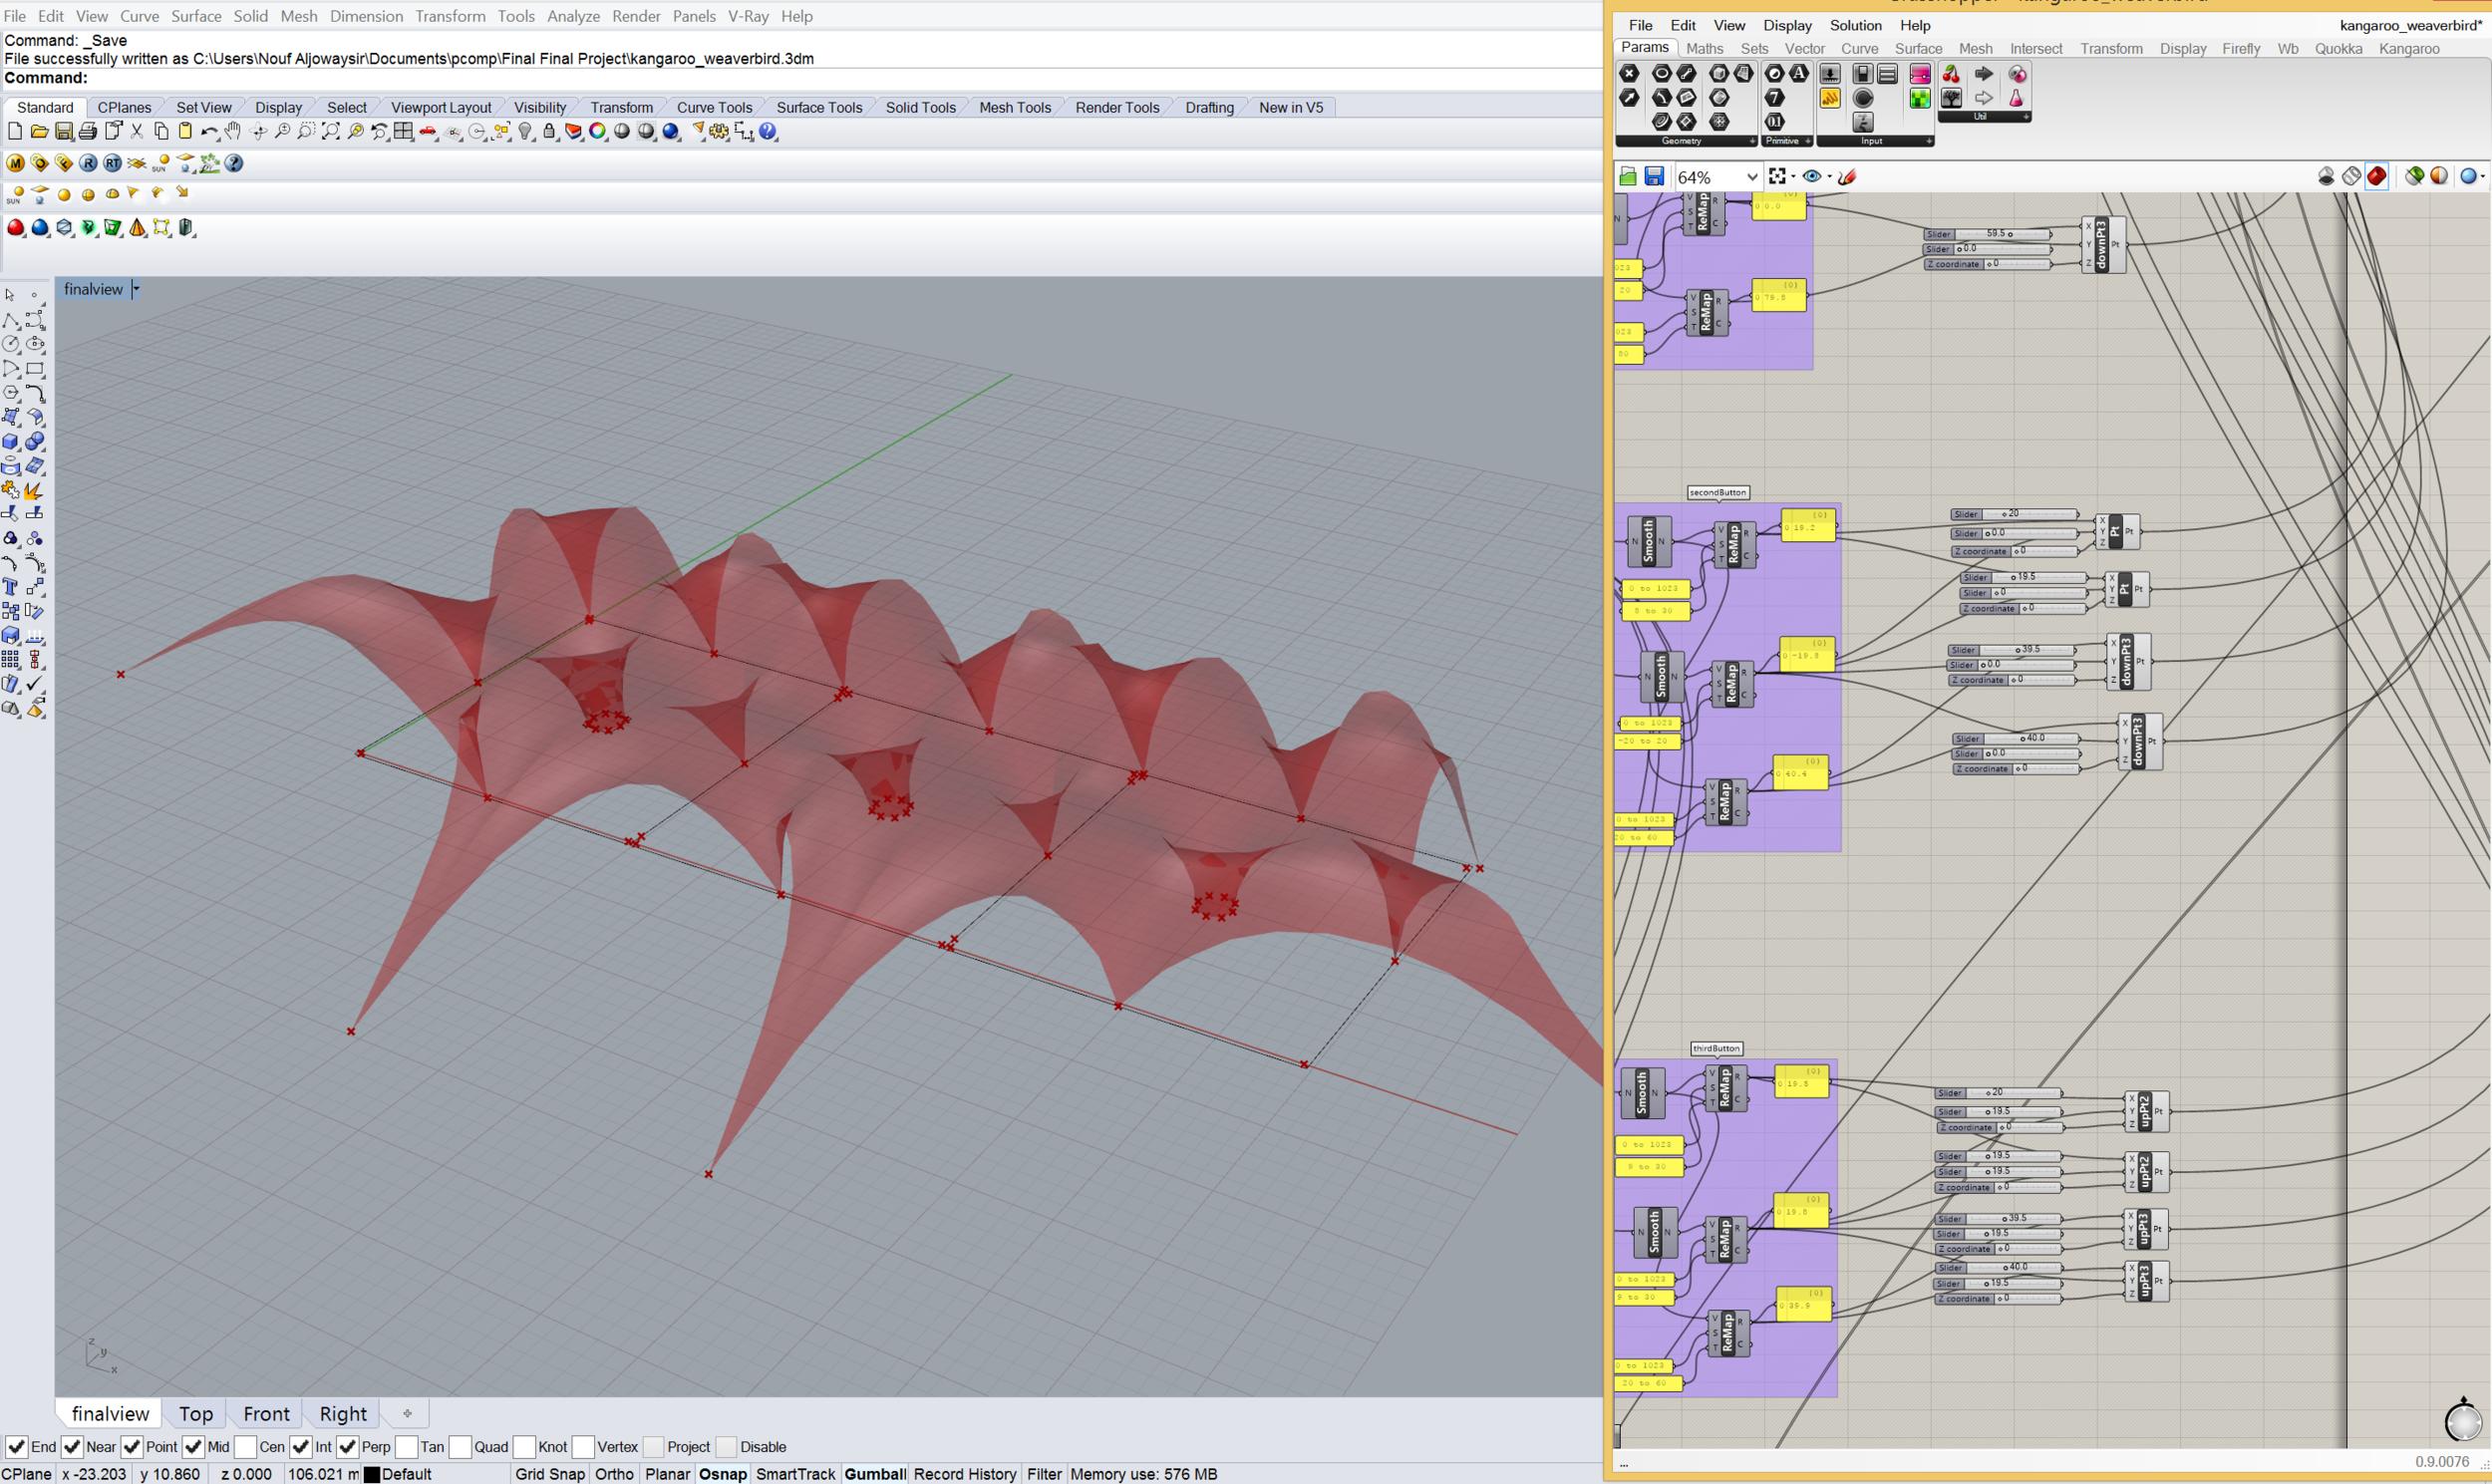 Model built using Grasshopper and physics engine called Kangaroo (in Rhino)